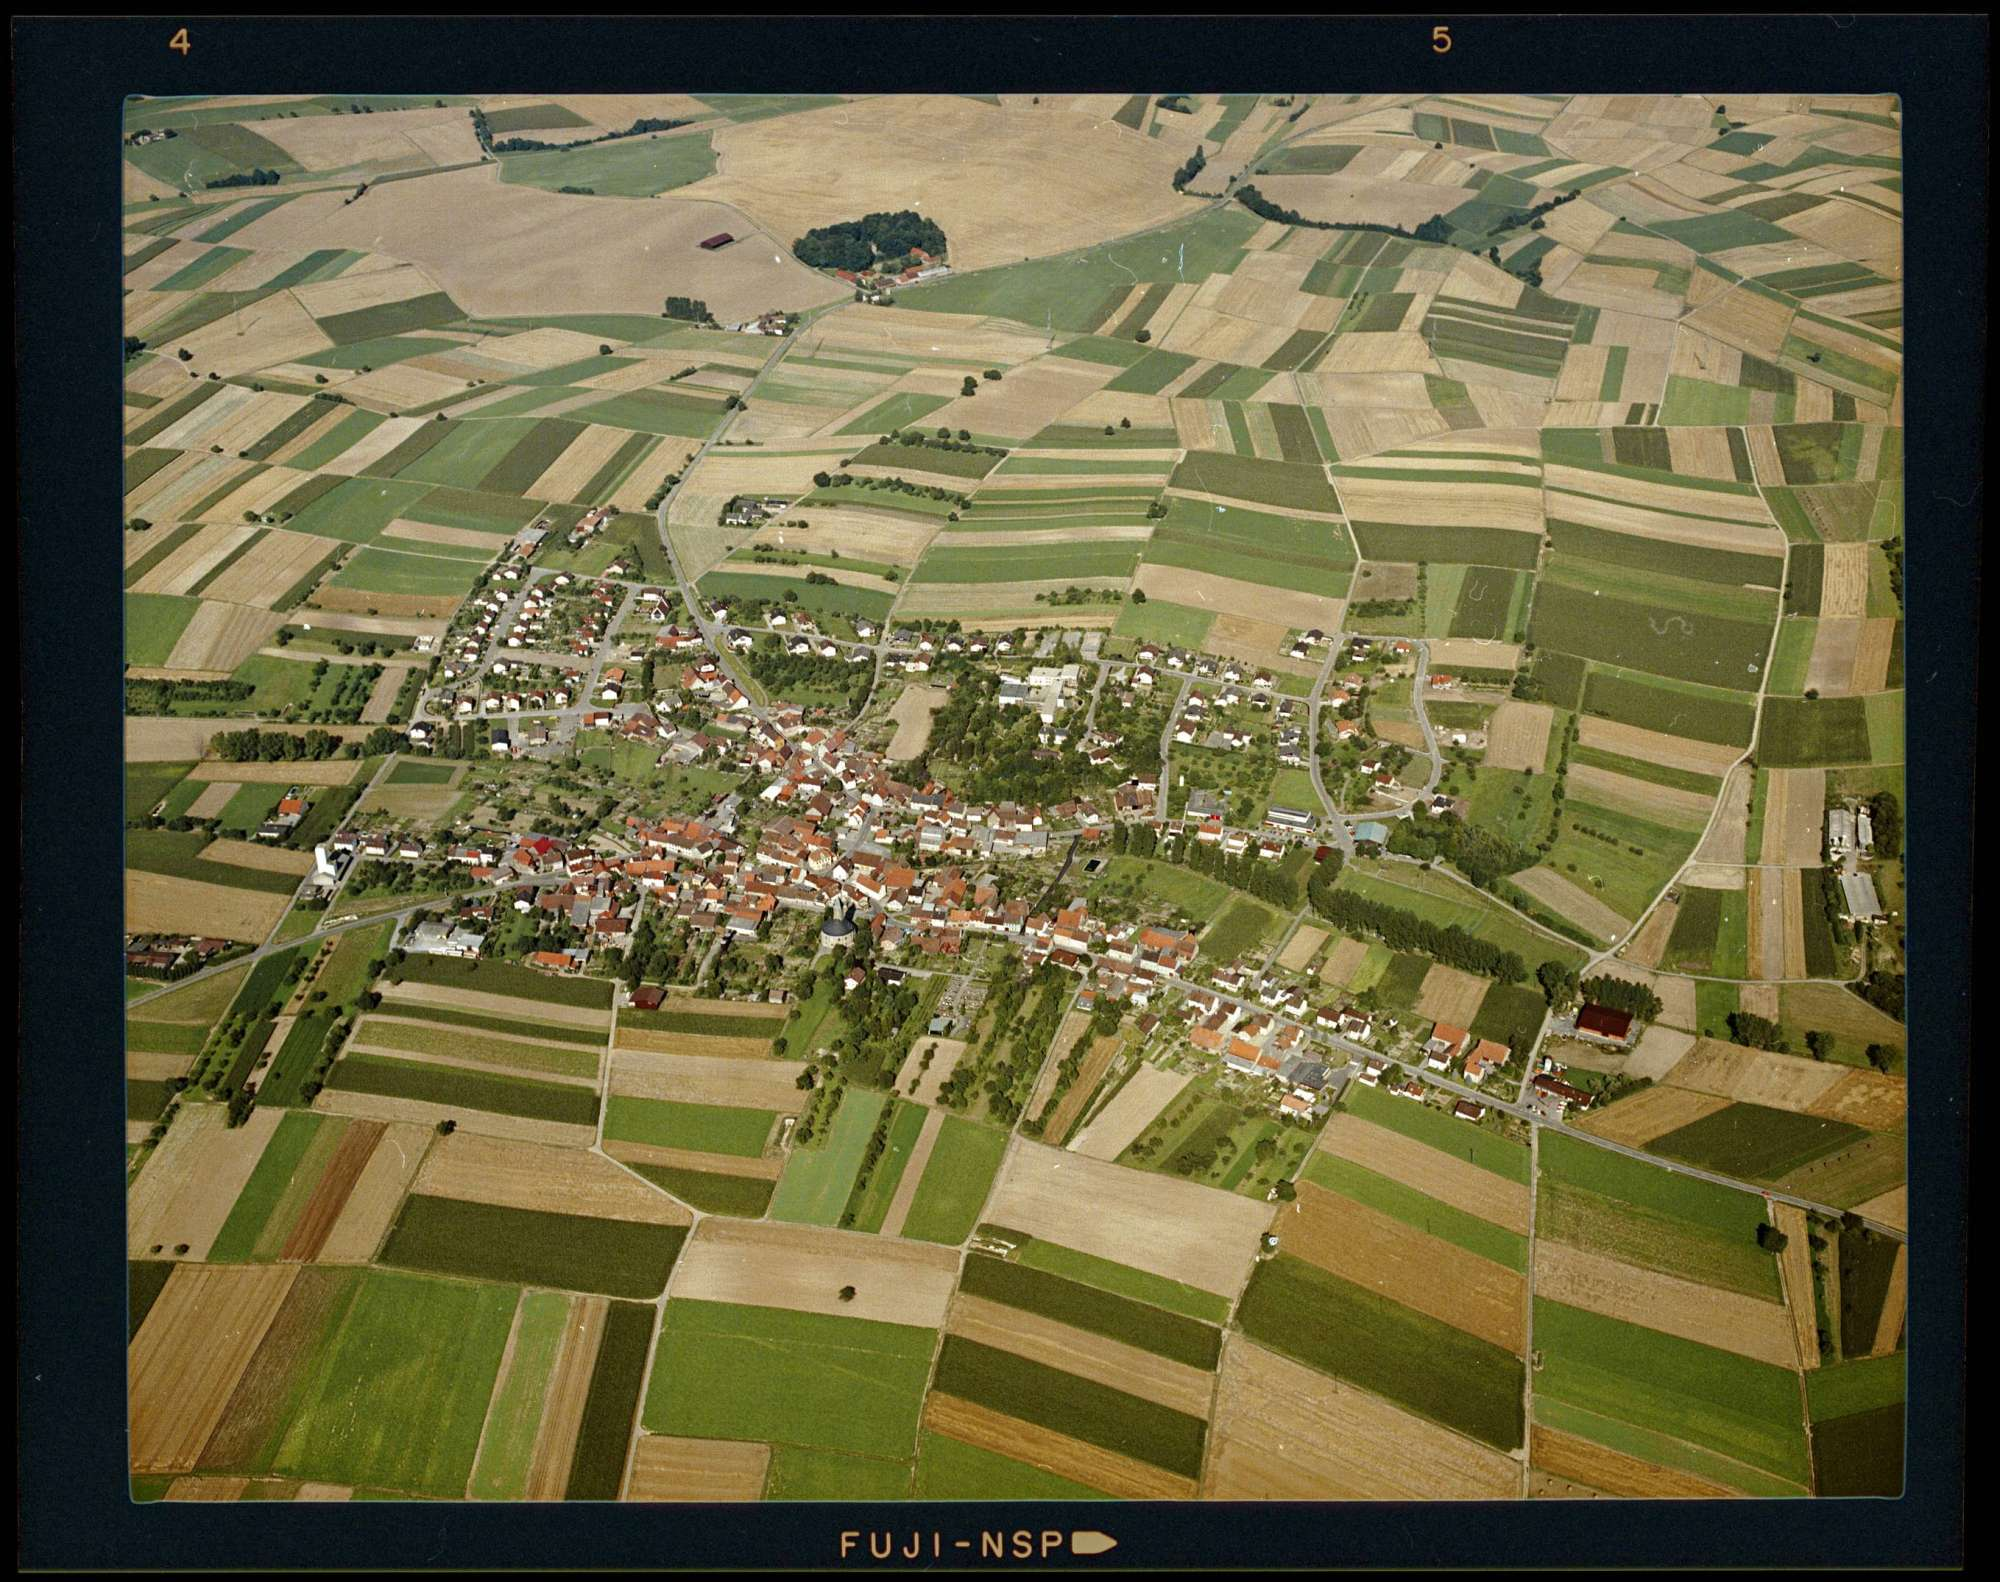 Adelshofen, Luftbild, Bild 1